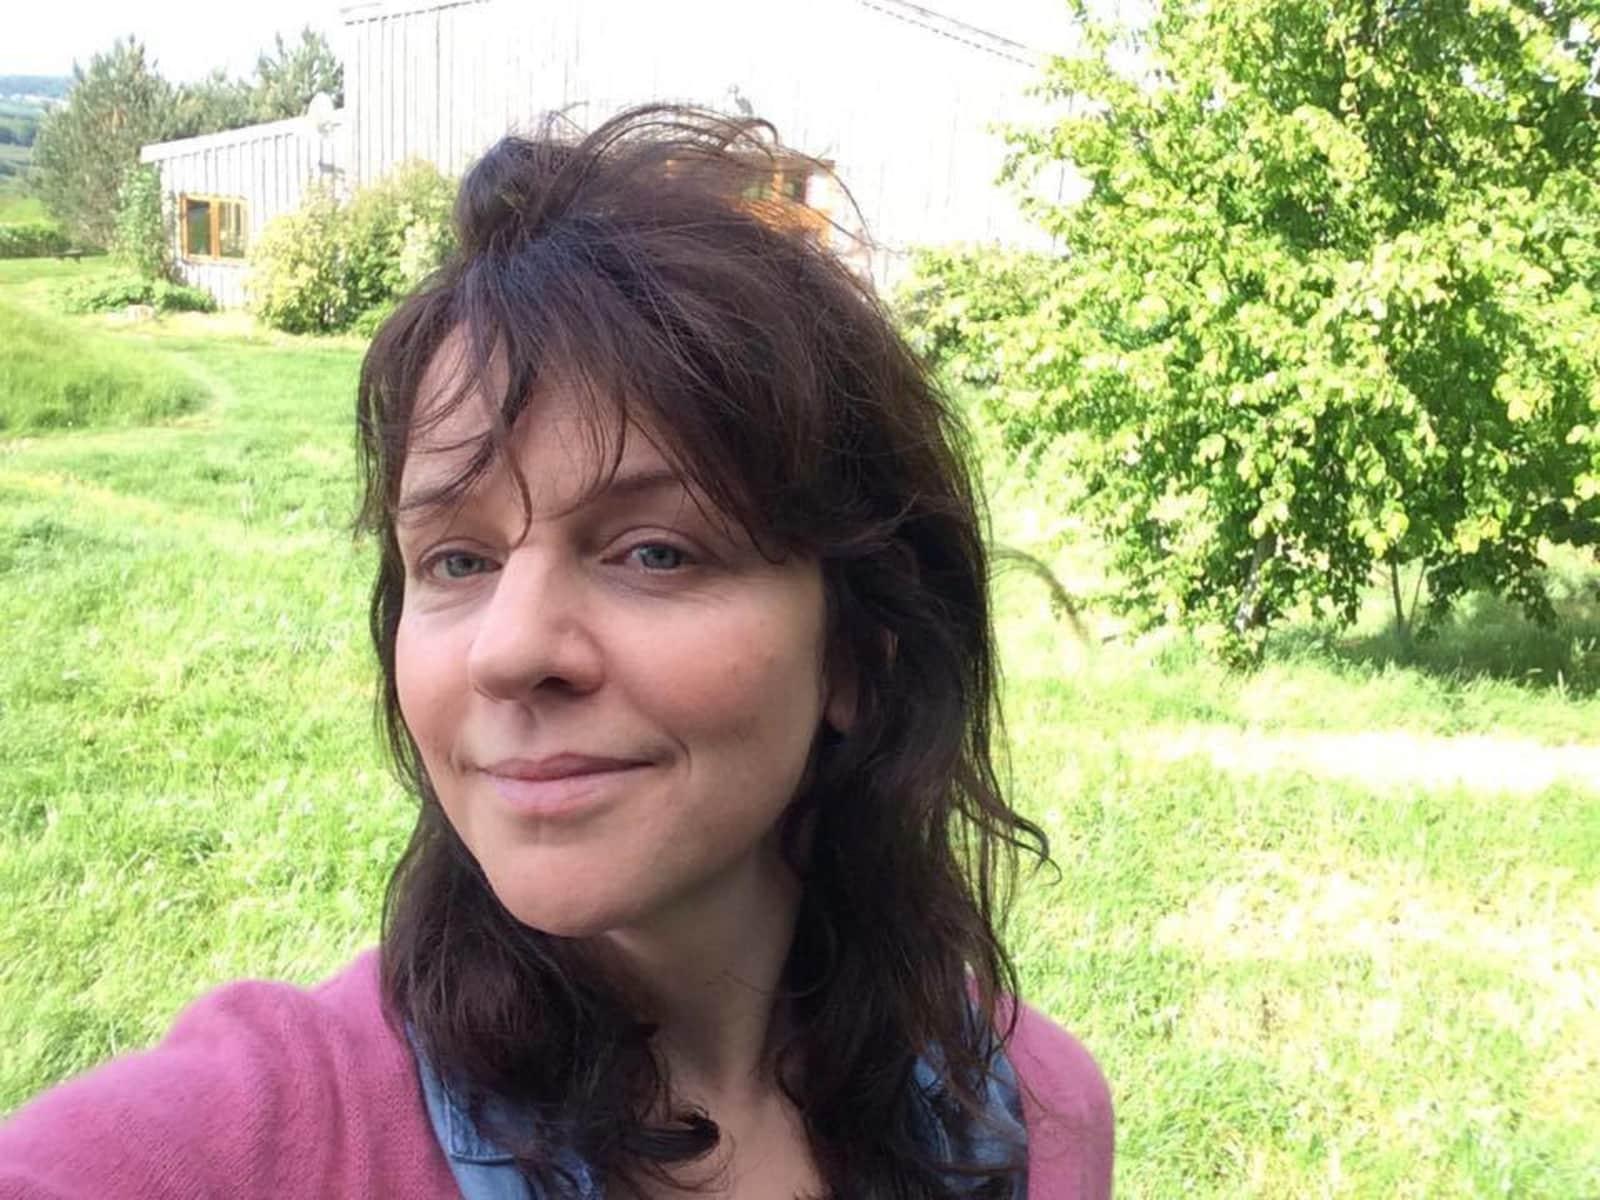 Susan from London, United Kingdom